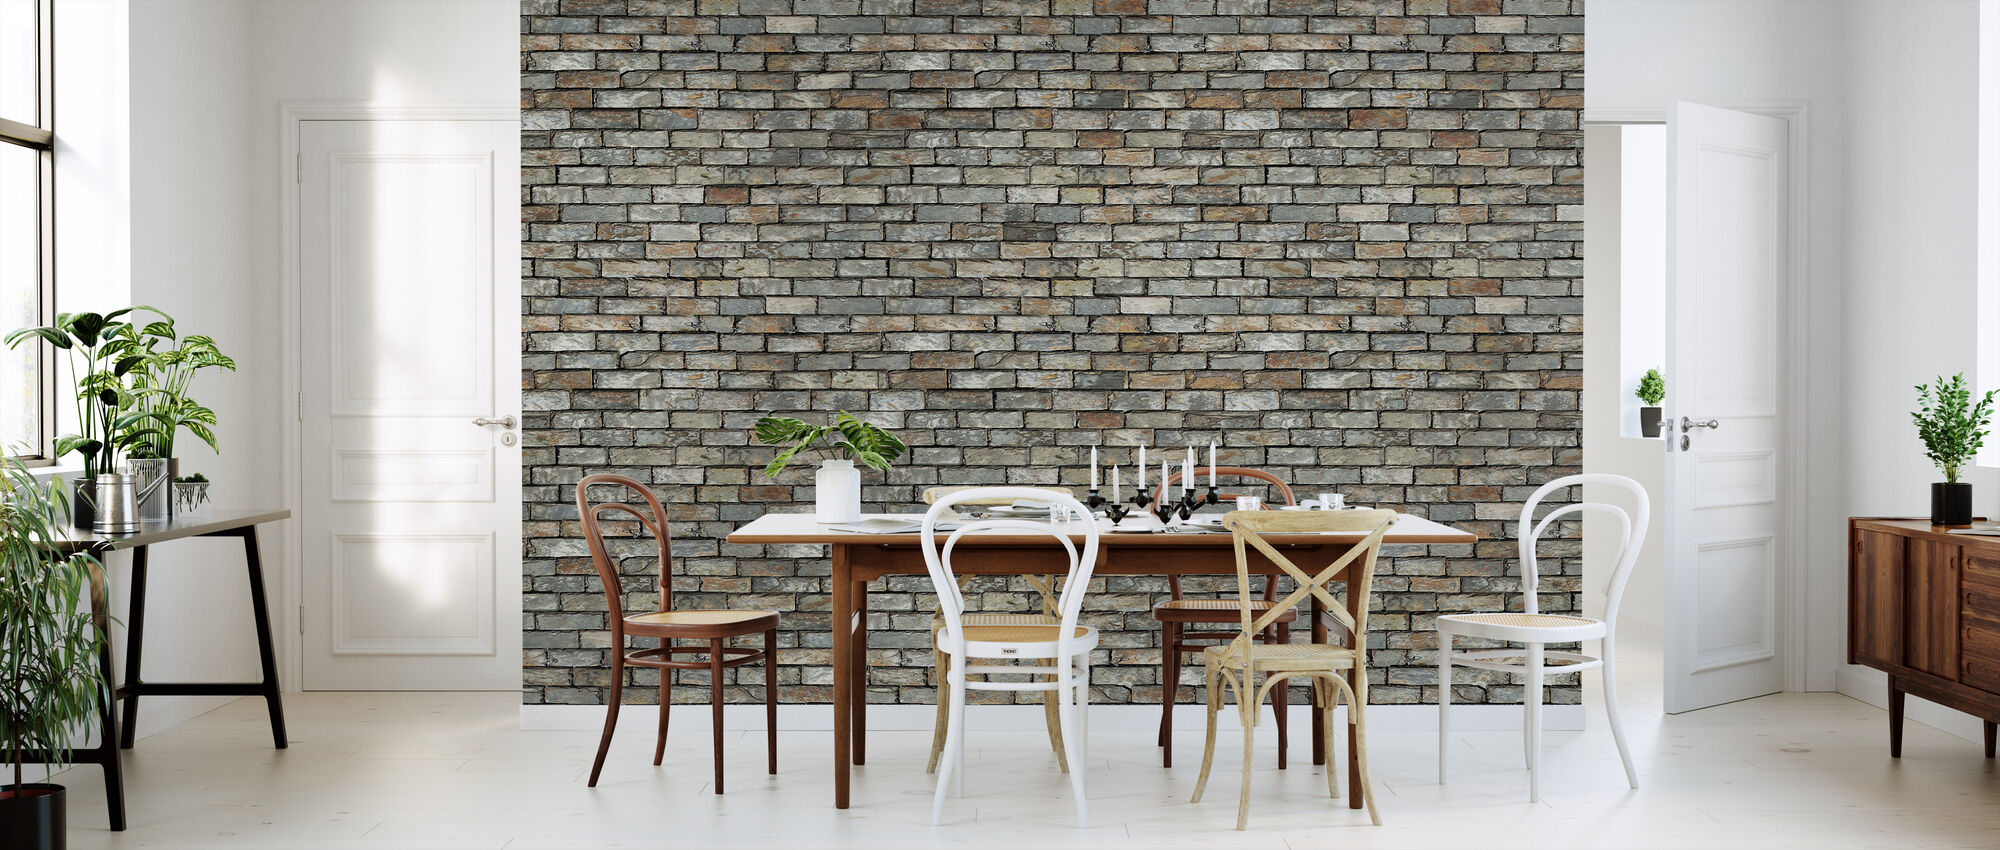 Stone Wall - Wallpaper - Kitchen